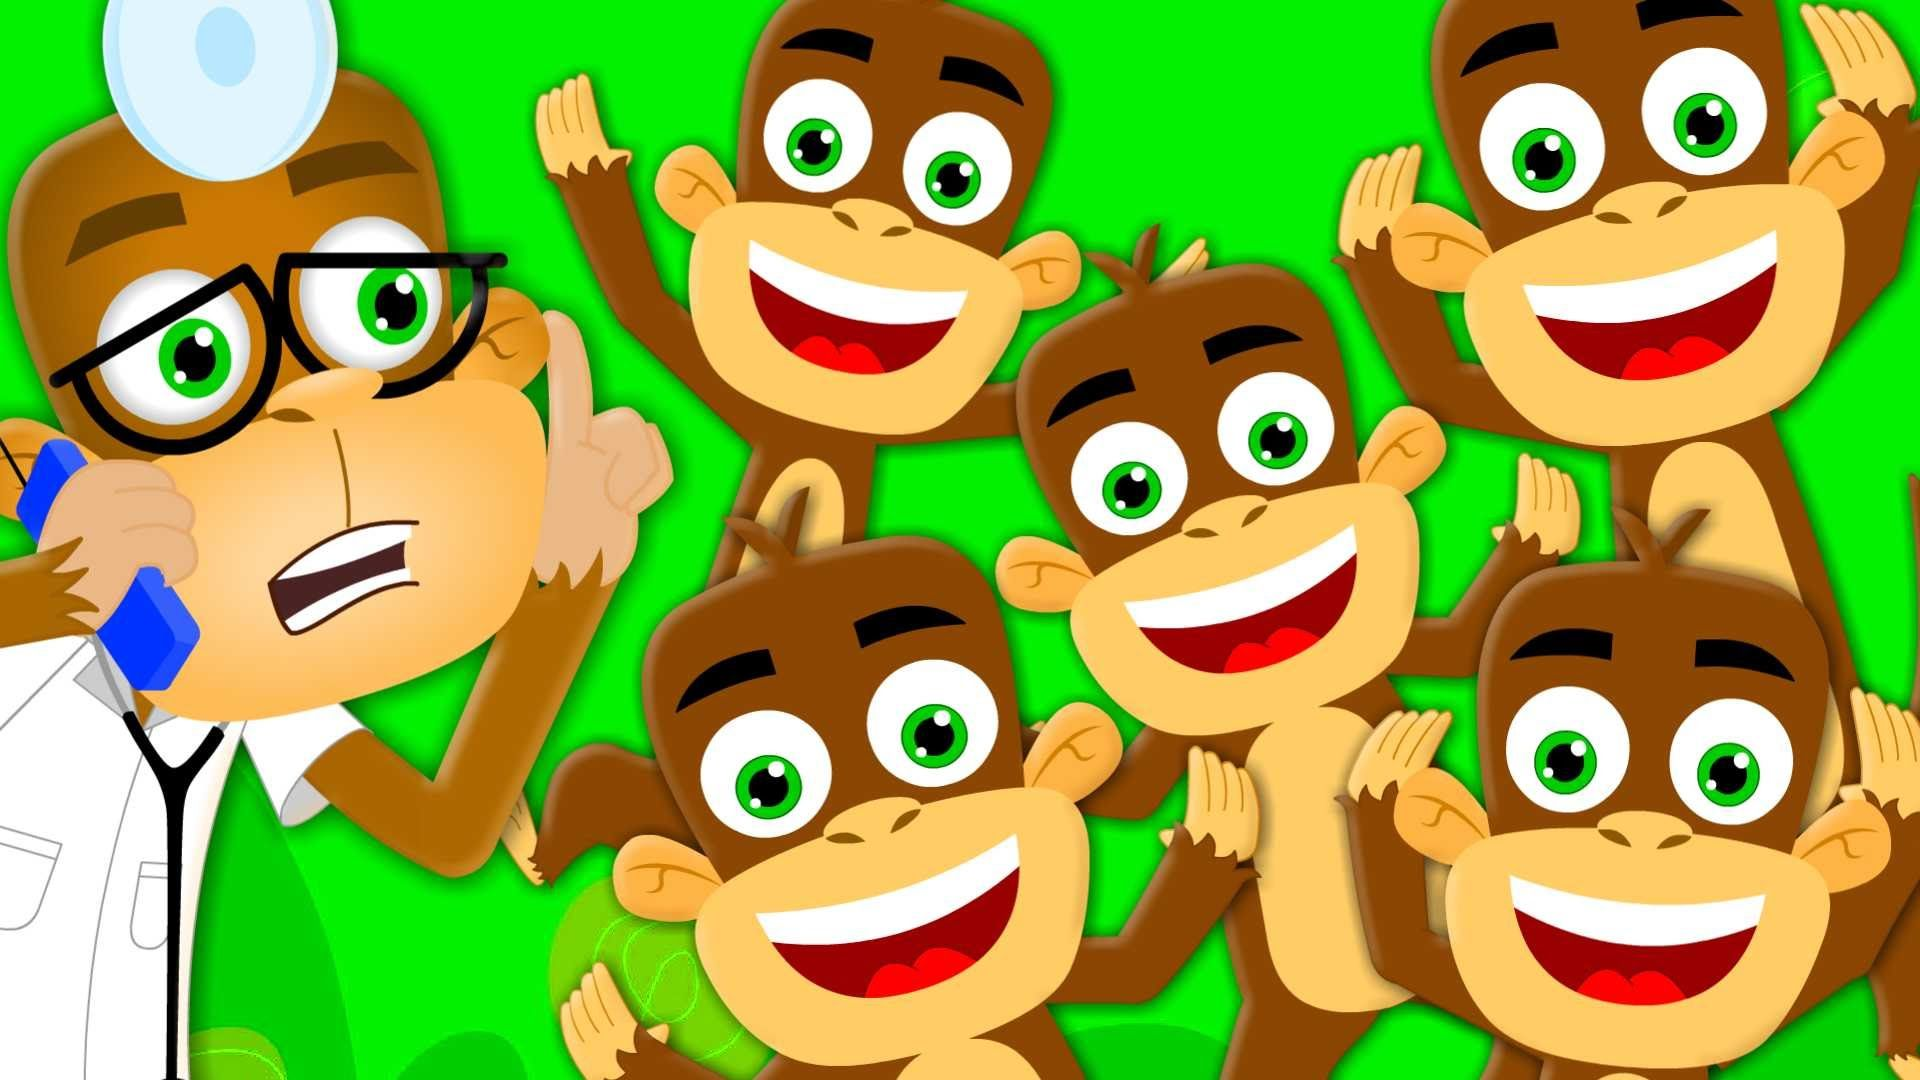 Five Little Monkeys Jumping On The Bed Nursery Rhymes Kids Songs C Kids Video Songs Five Little Monkeys Nursery Rhymes Activities